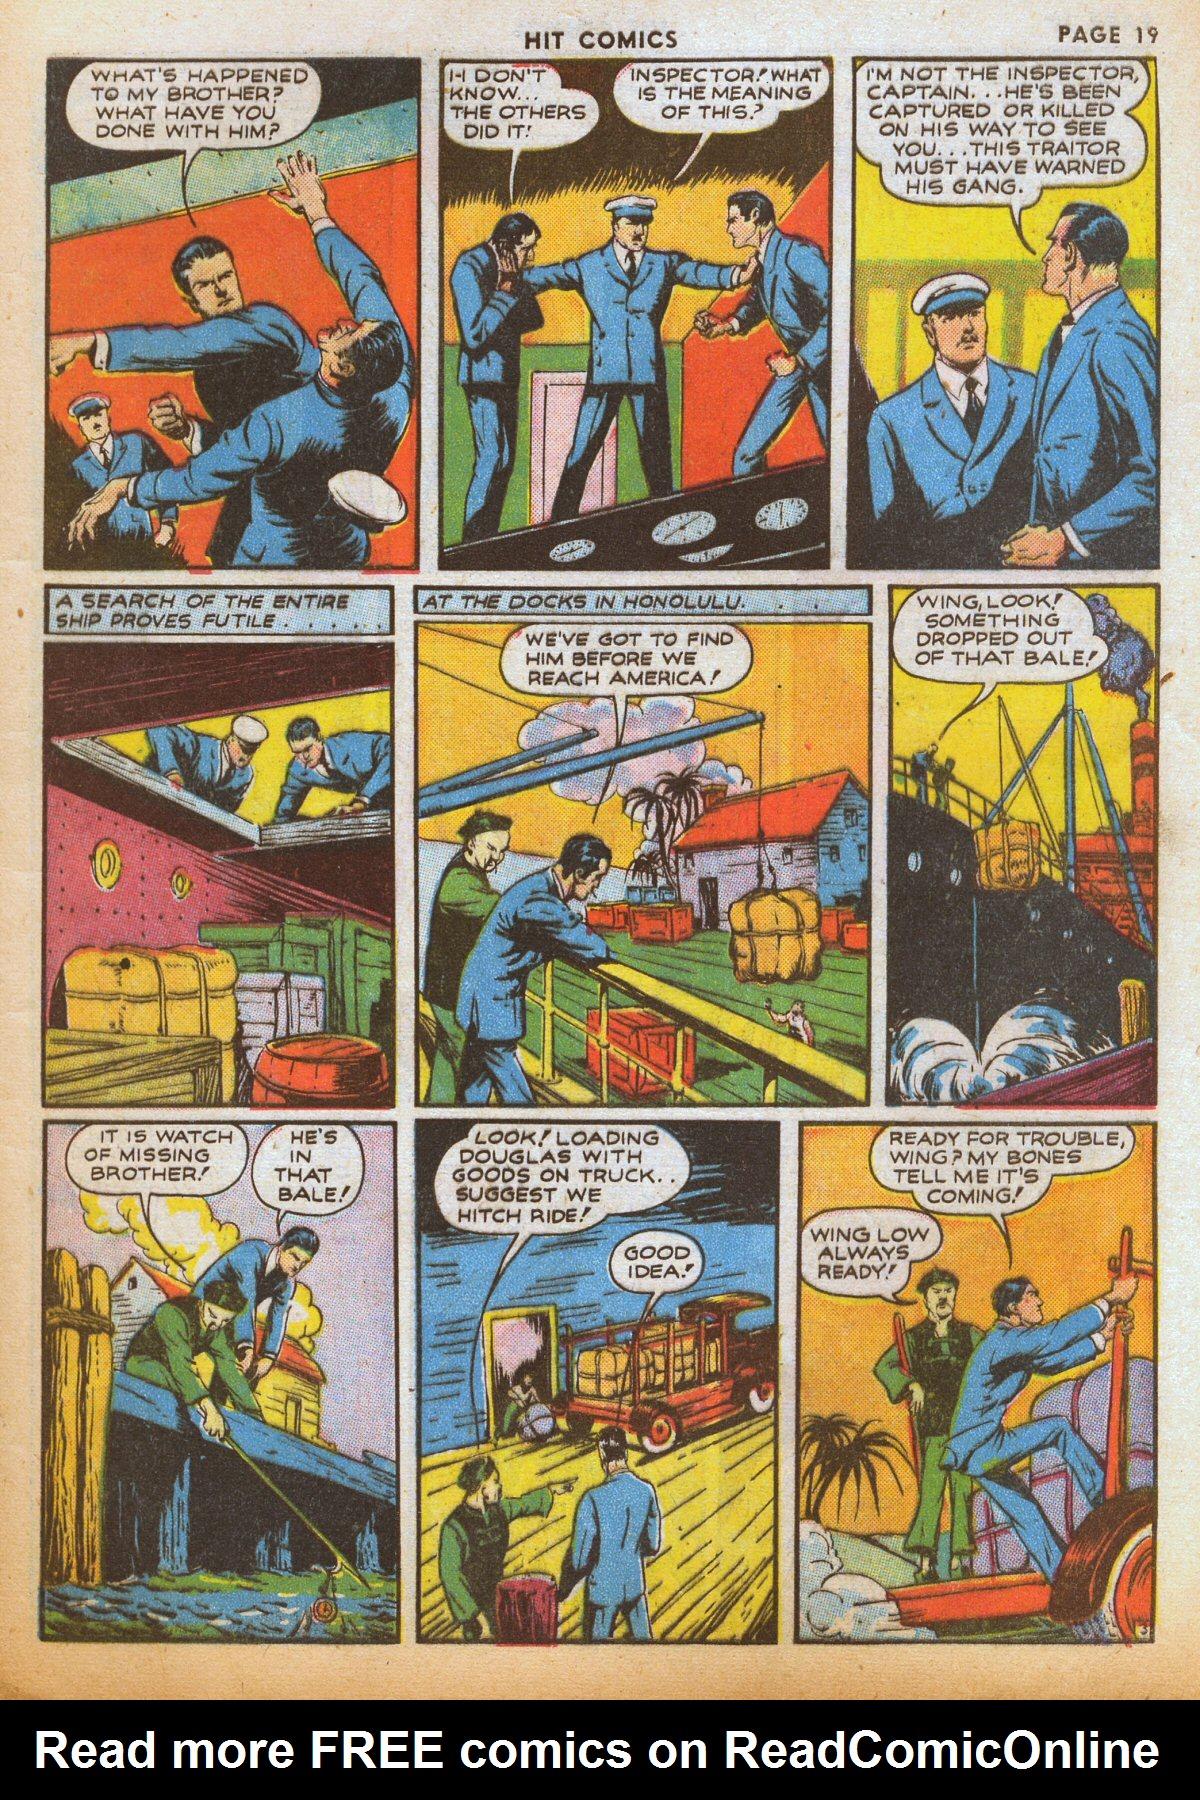 Read online Hit Comics comic -  Issue #12 - 21